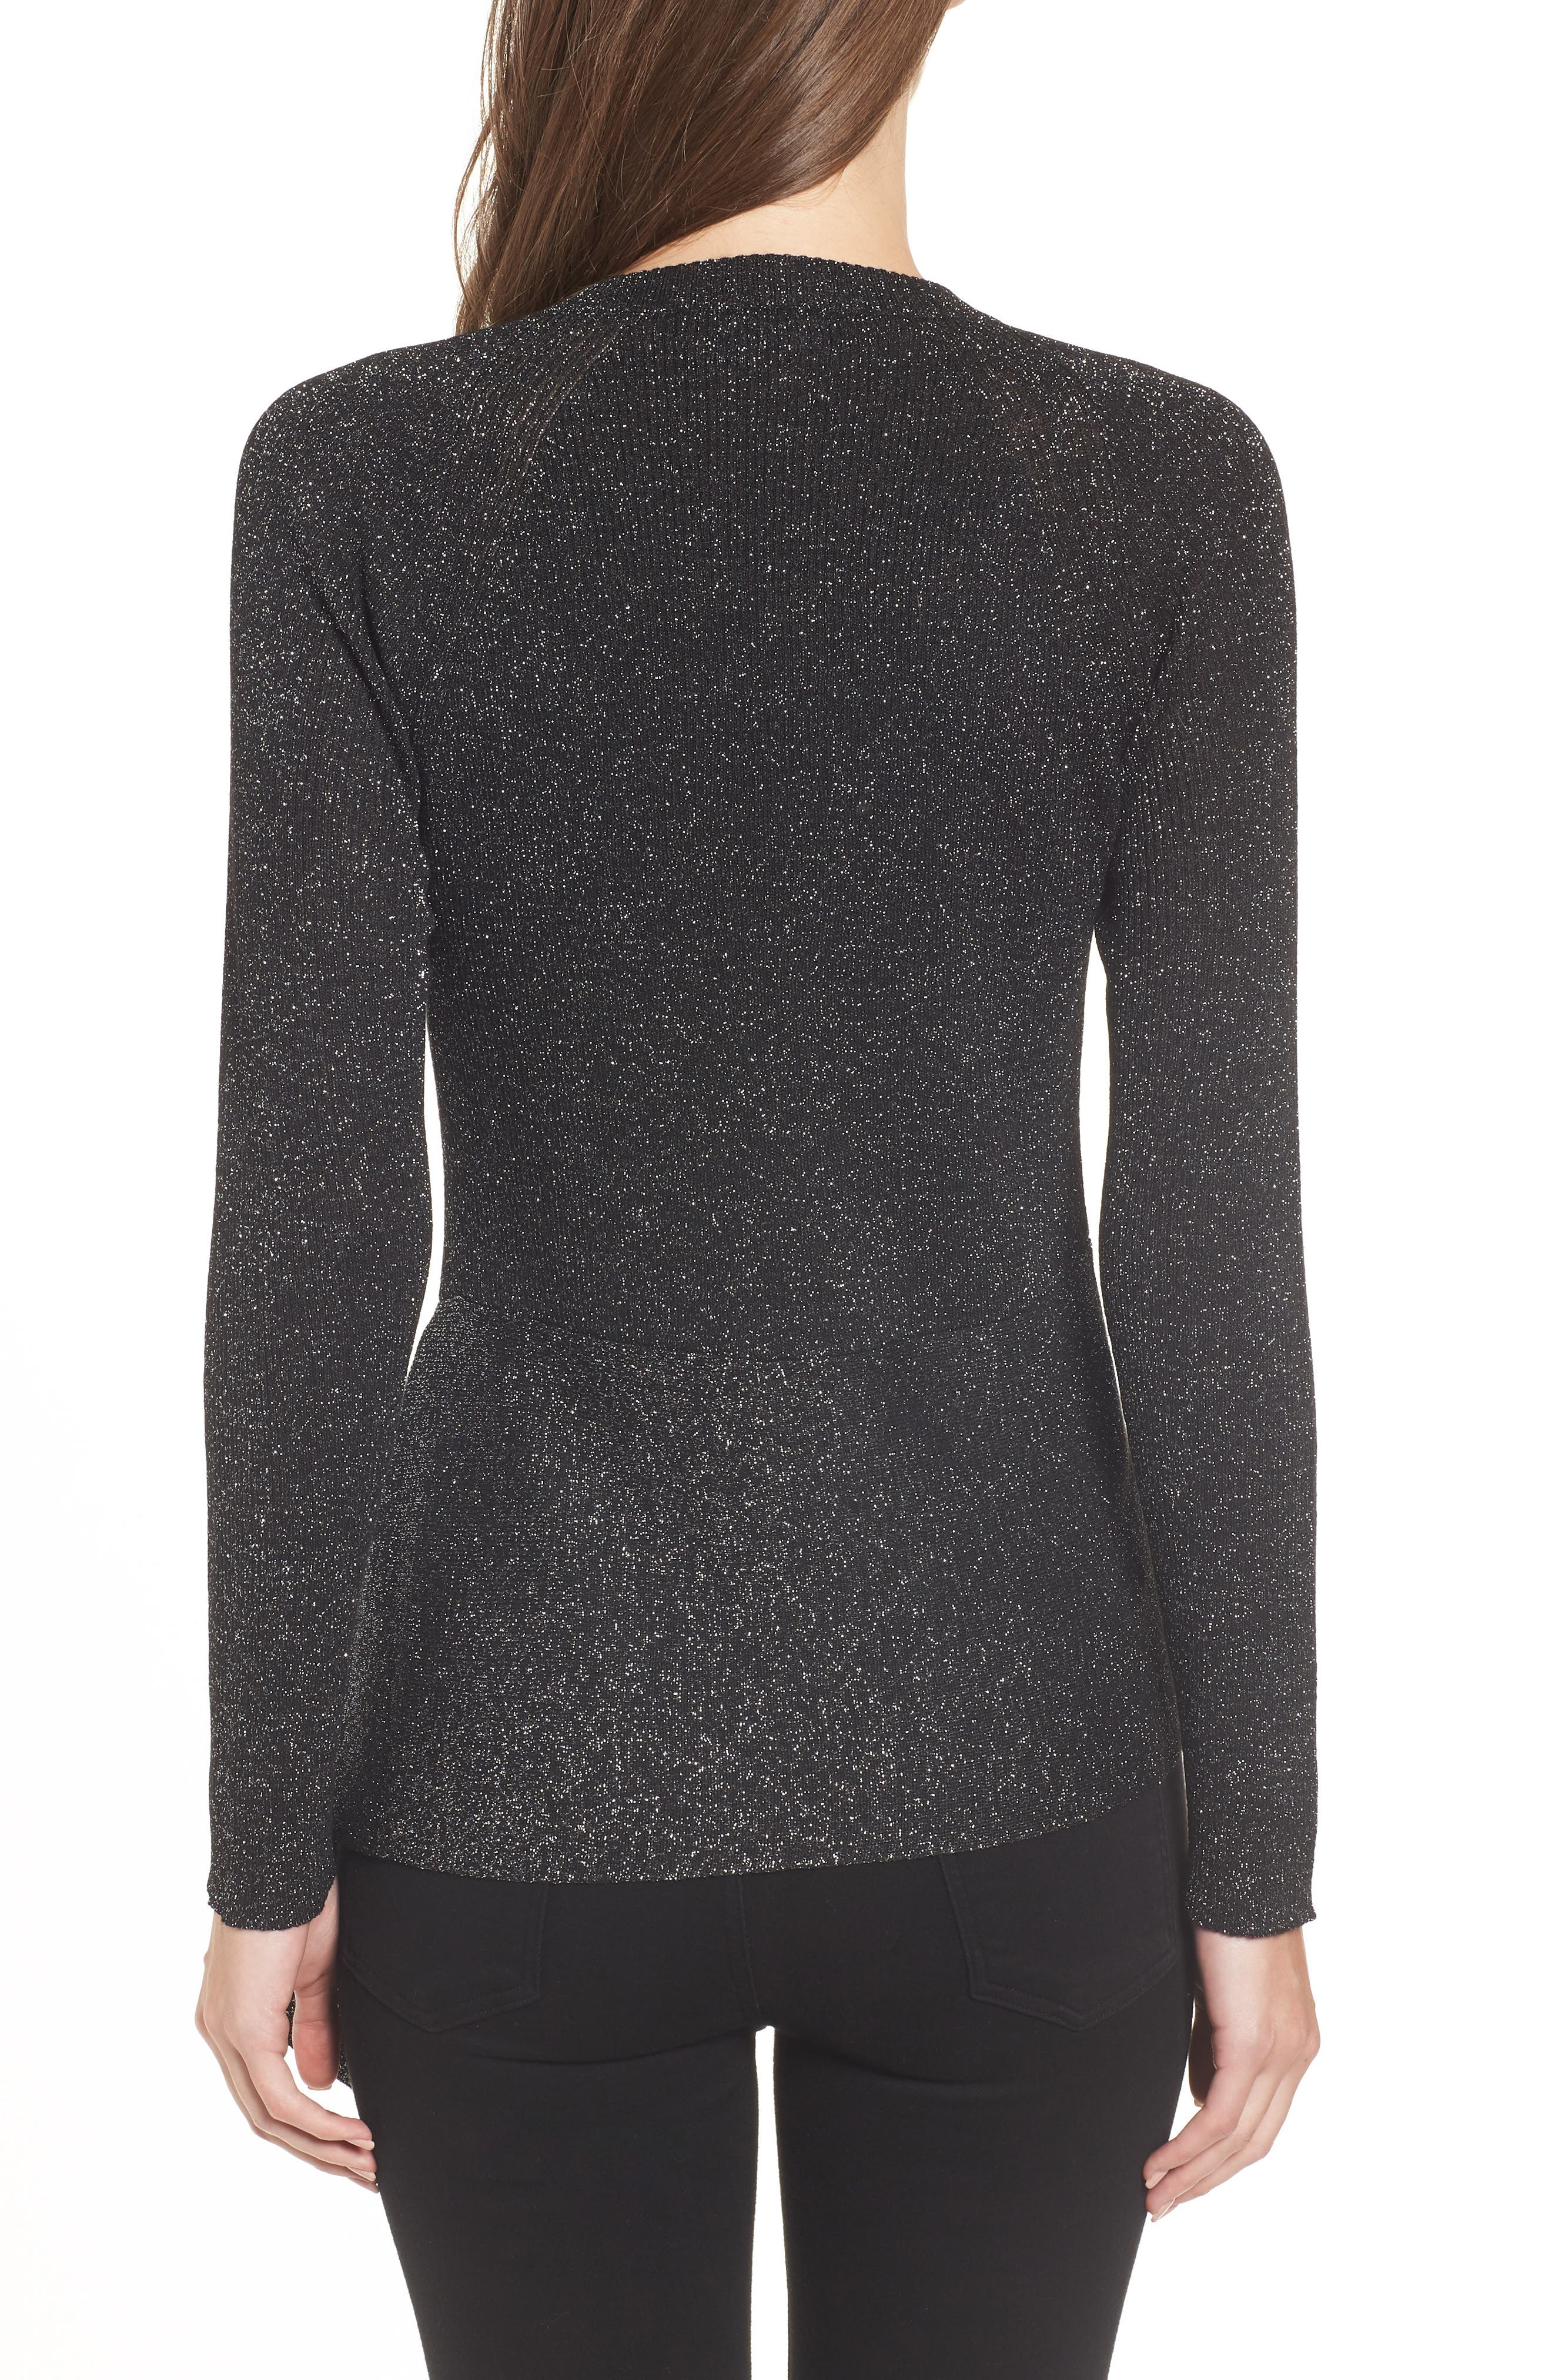 Drape Waist Sweater,                             Alternate thumbnail 2, color,                             BLACK- SILVER SPANGLE METALLIC